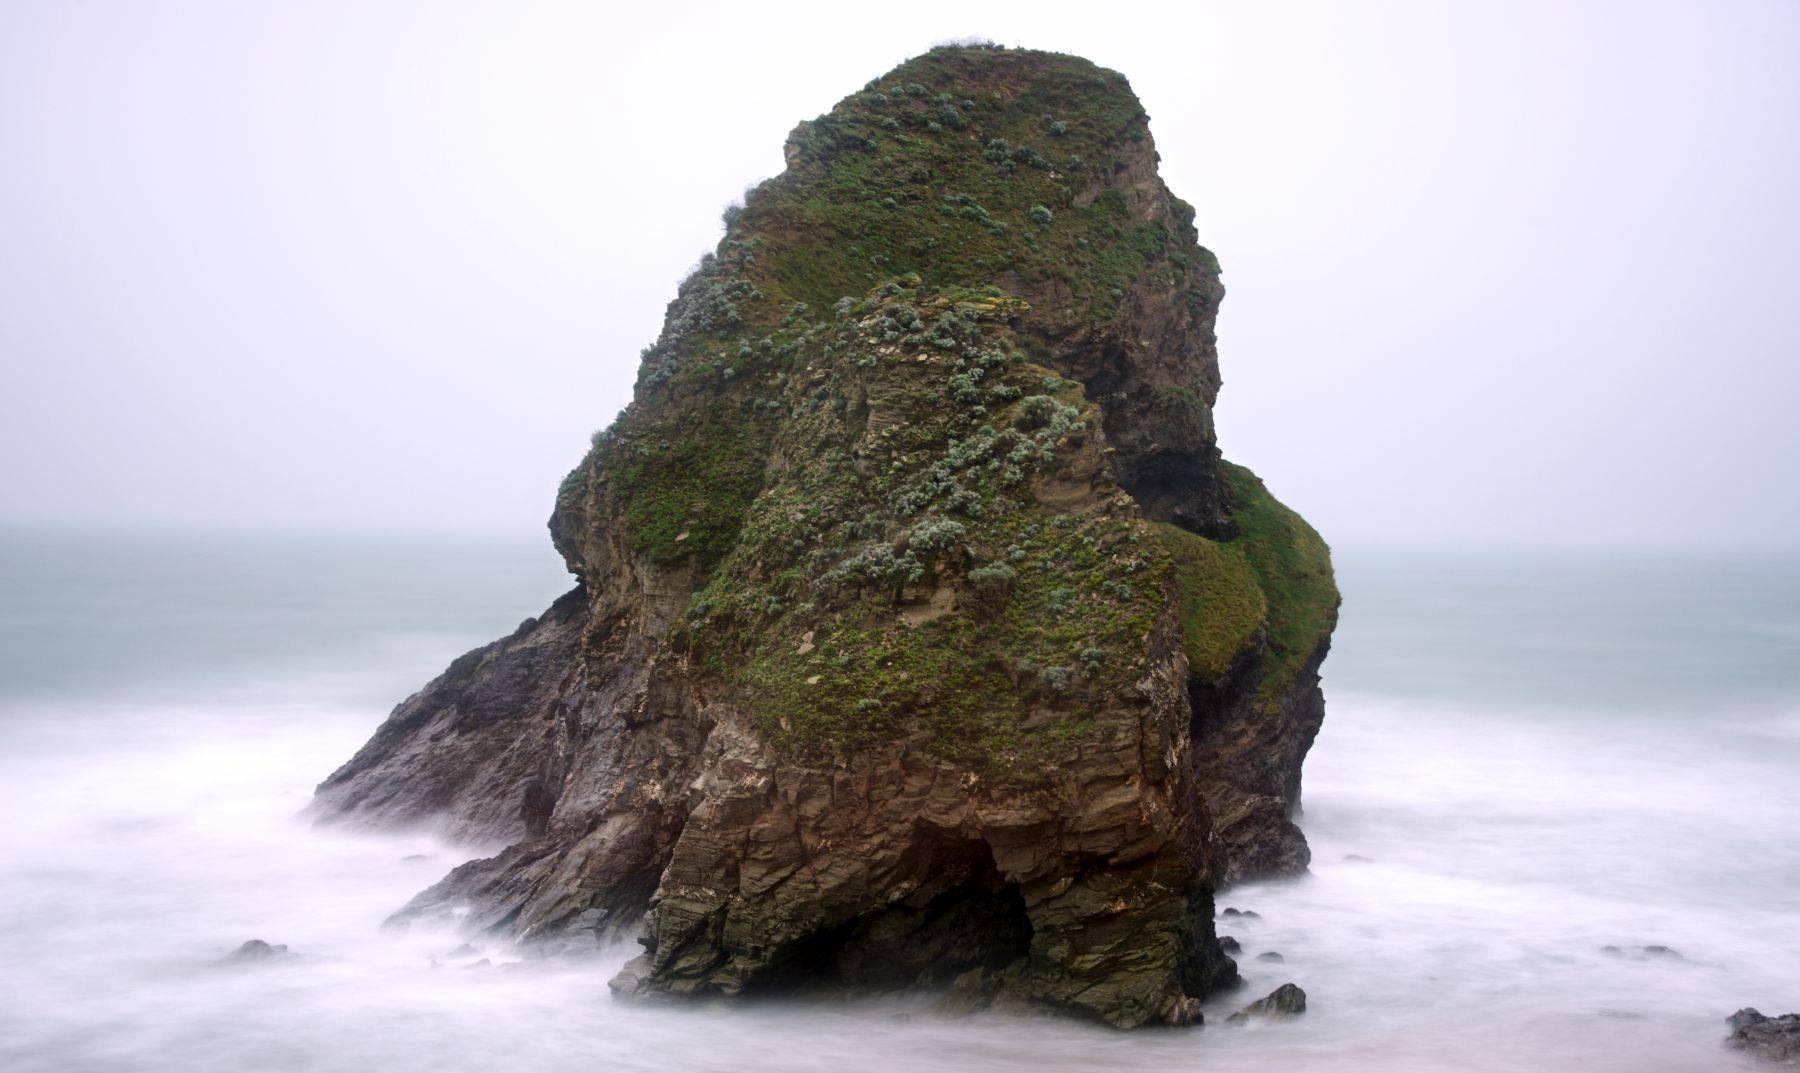 Newquay, Cornwall England